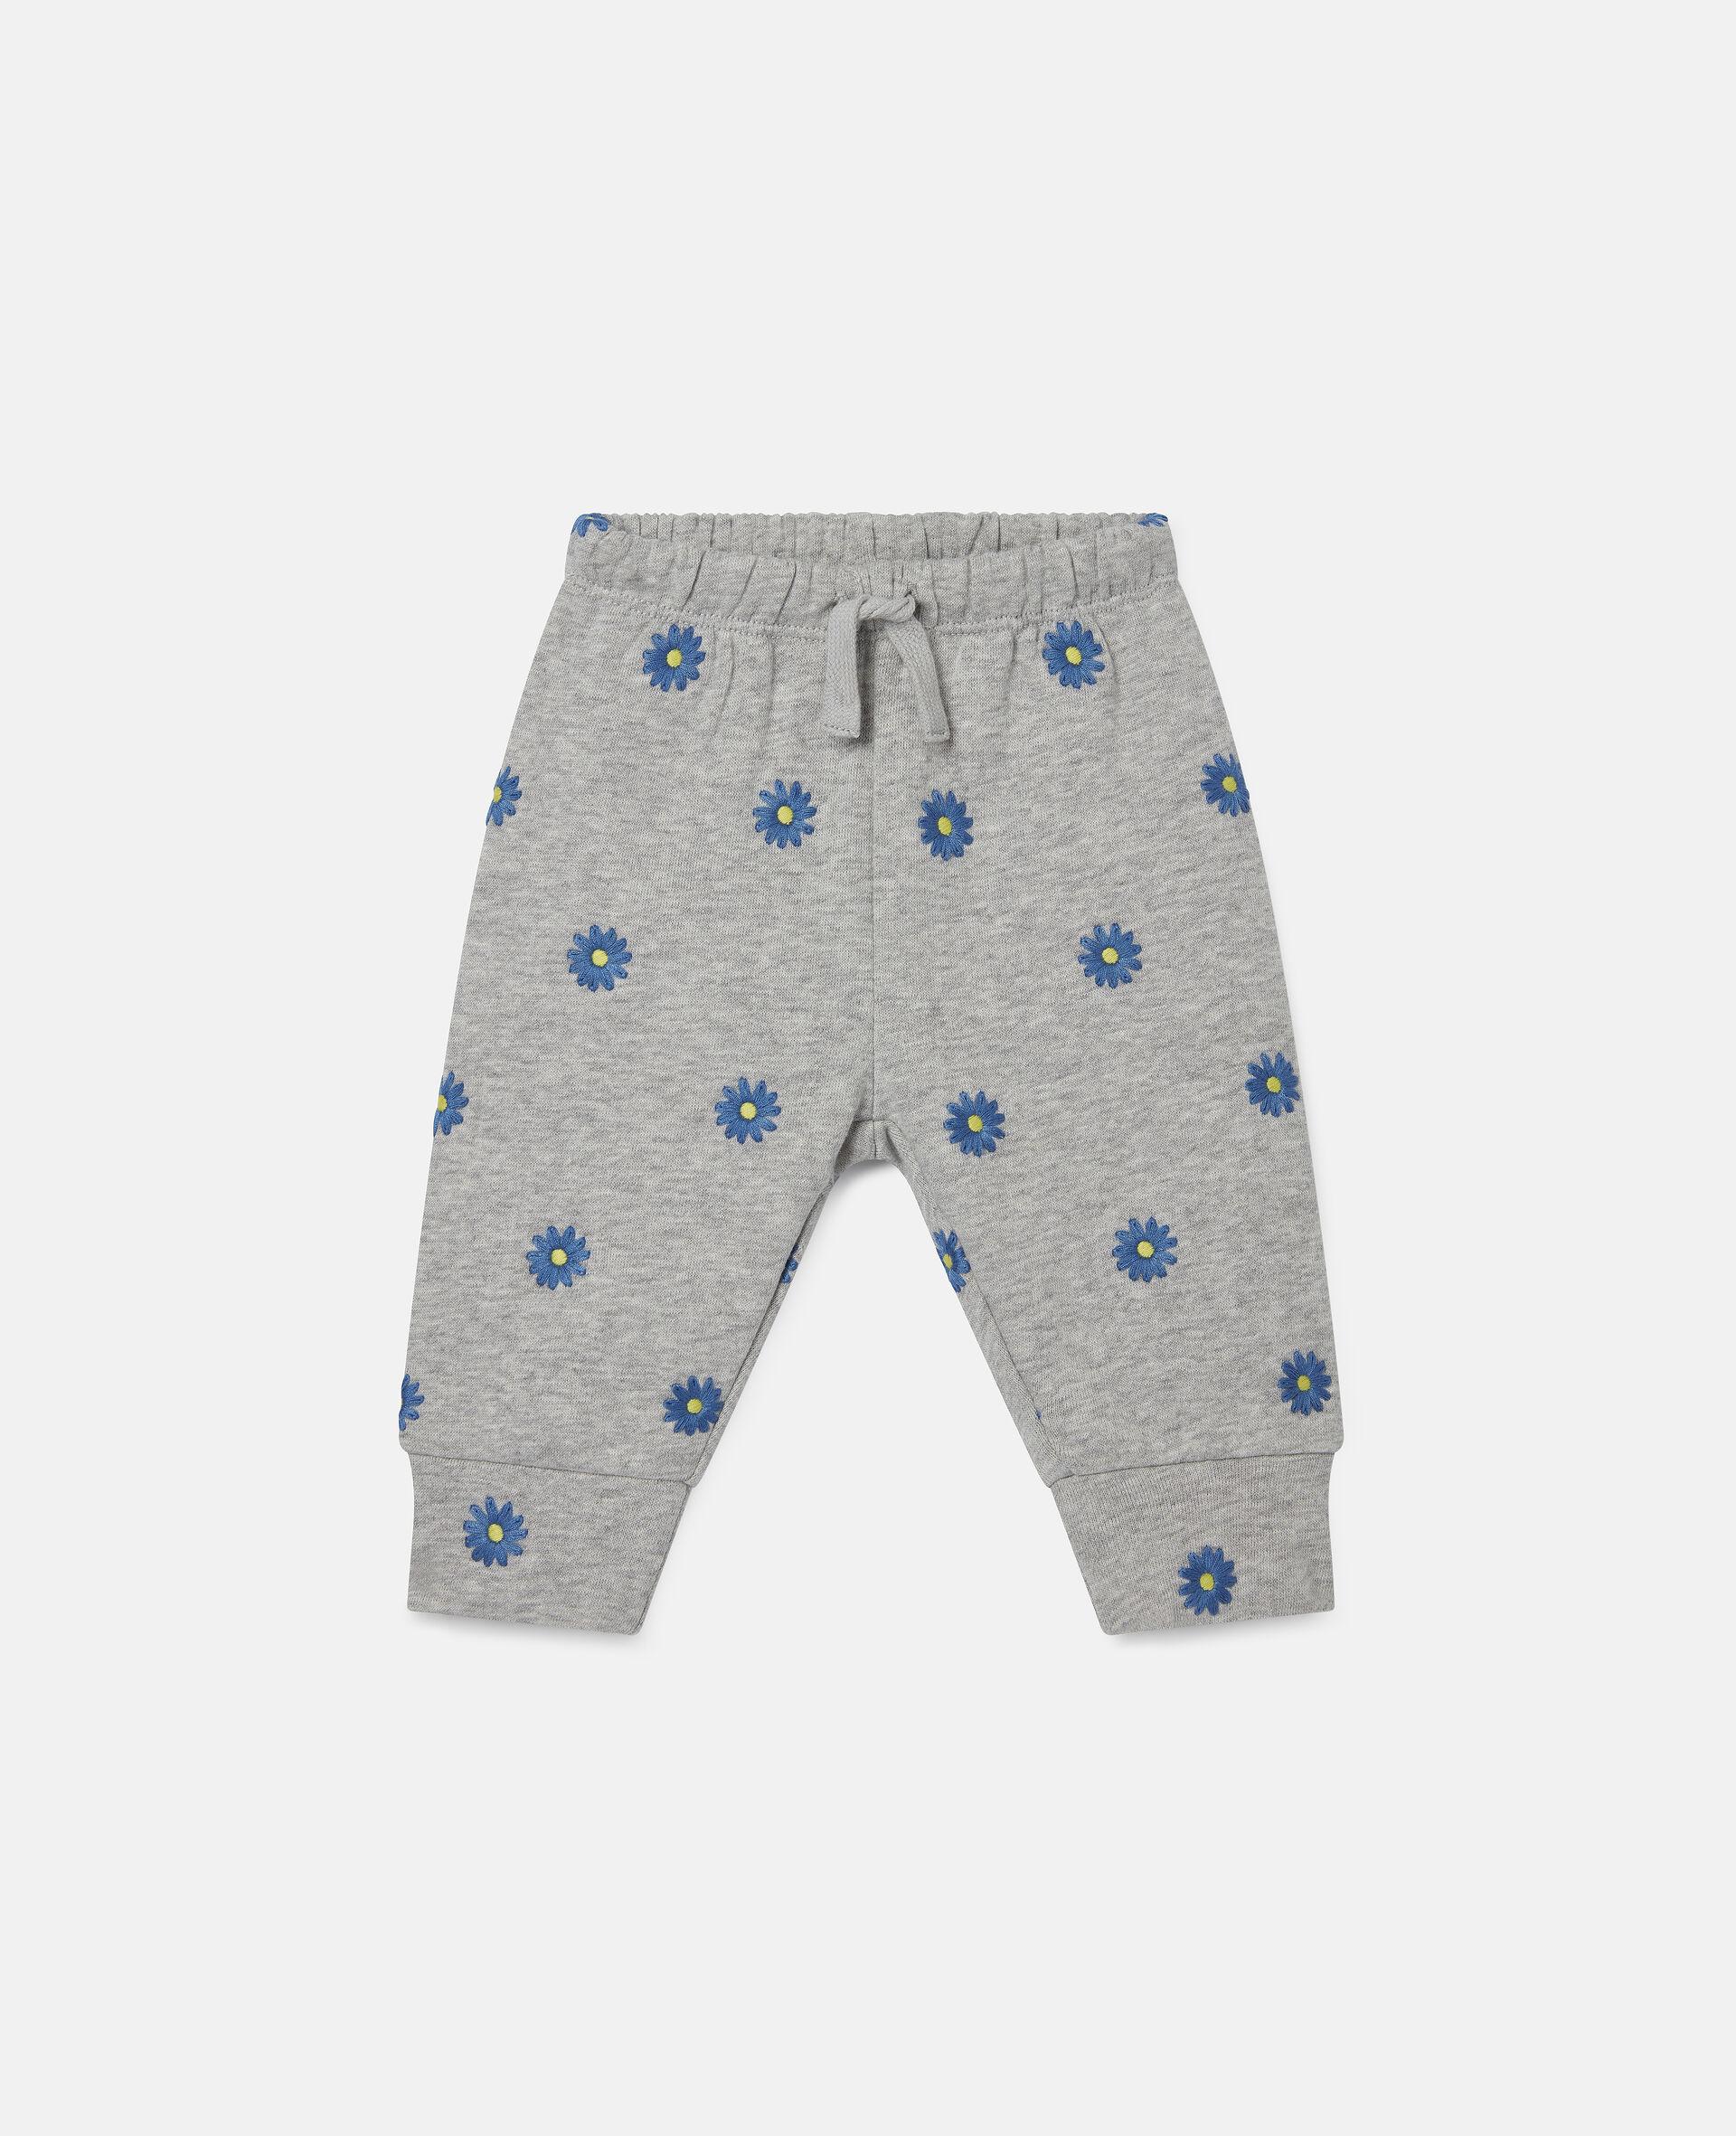 Pantaloni in Felpa di Cotone con Margherite Ricamate-Grigio-large image number 0